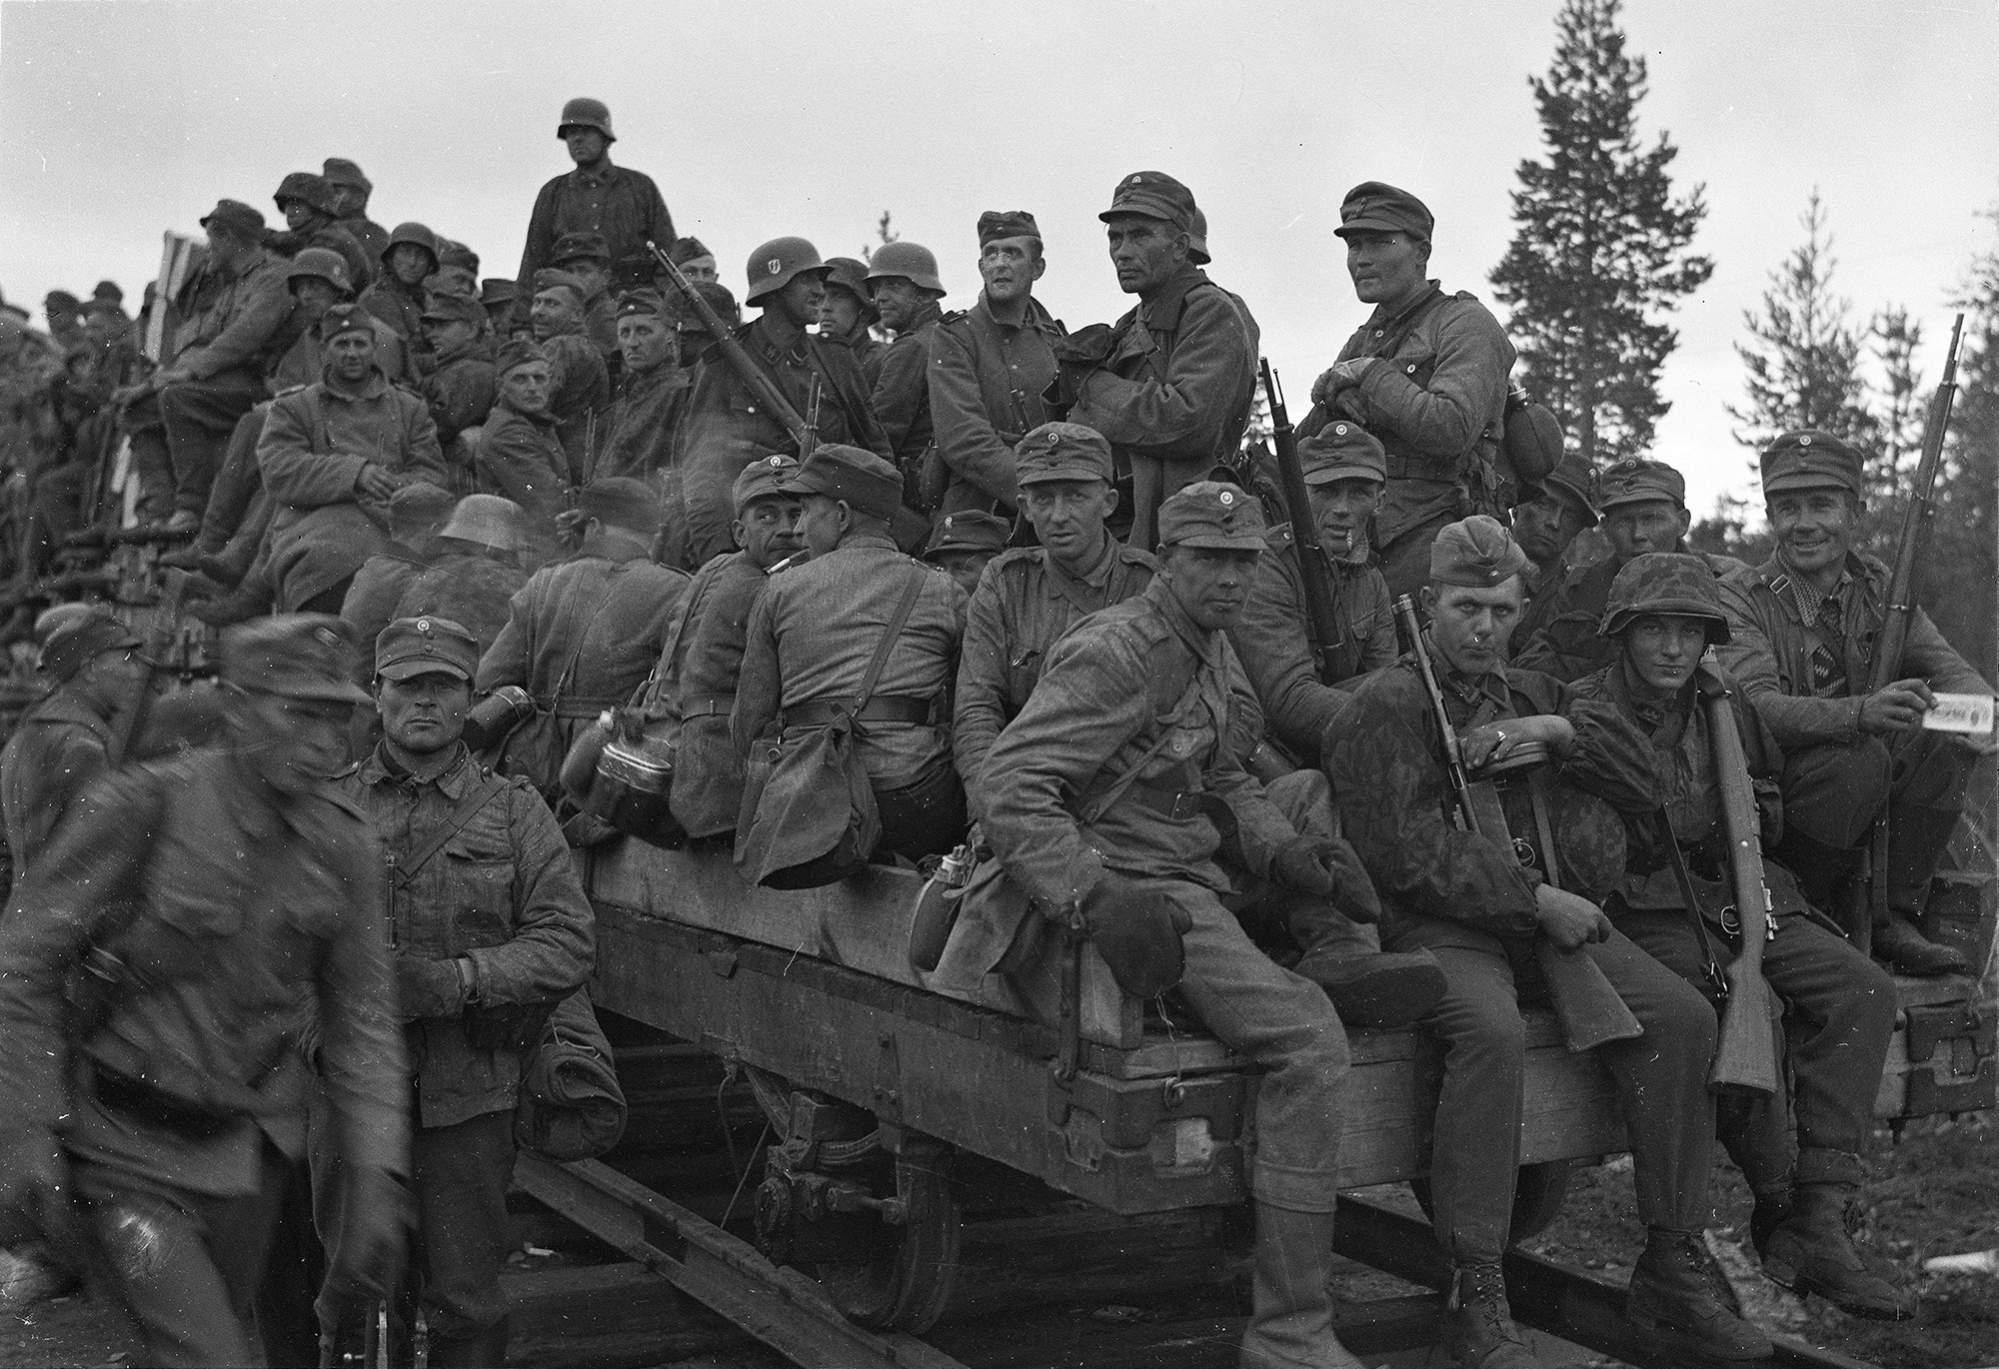 Finland's Nazi Past and the SS Martti Ahtisaari